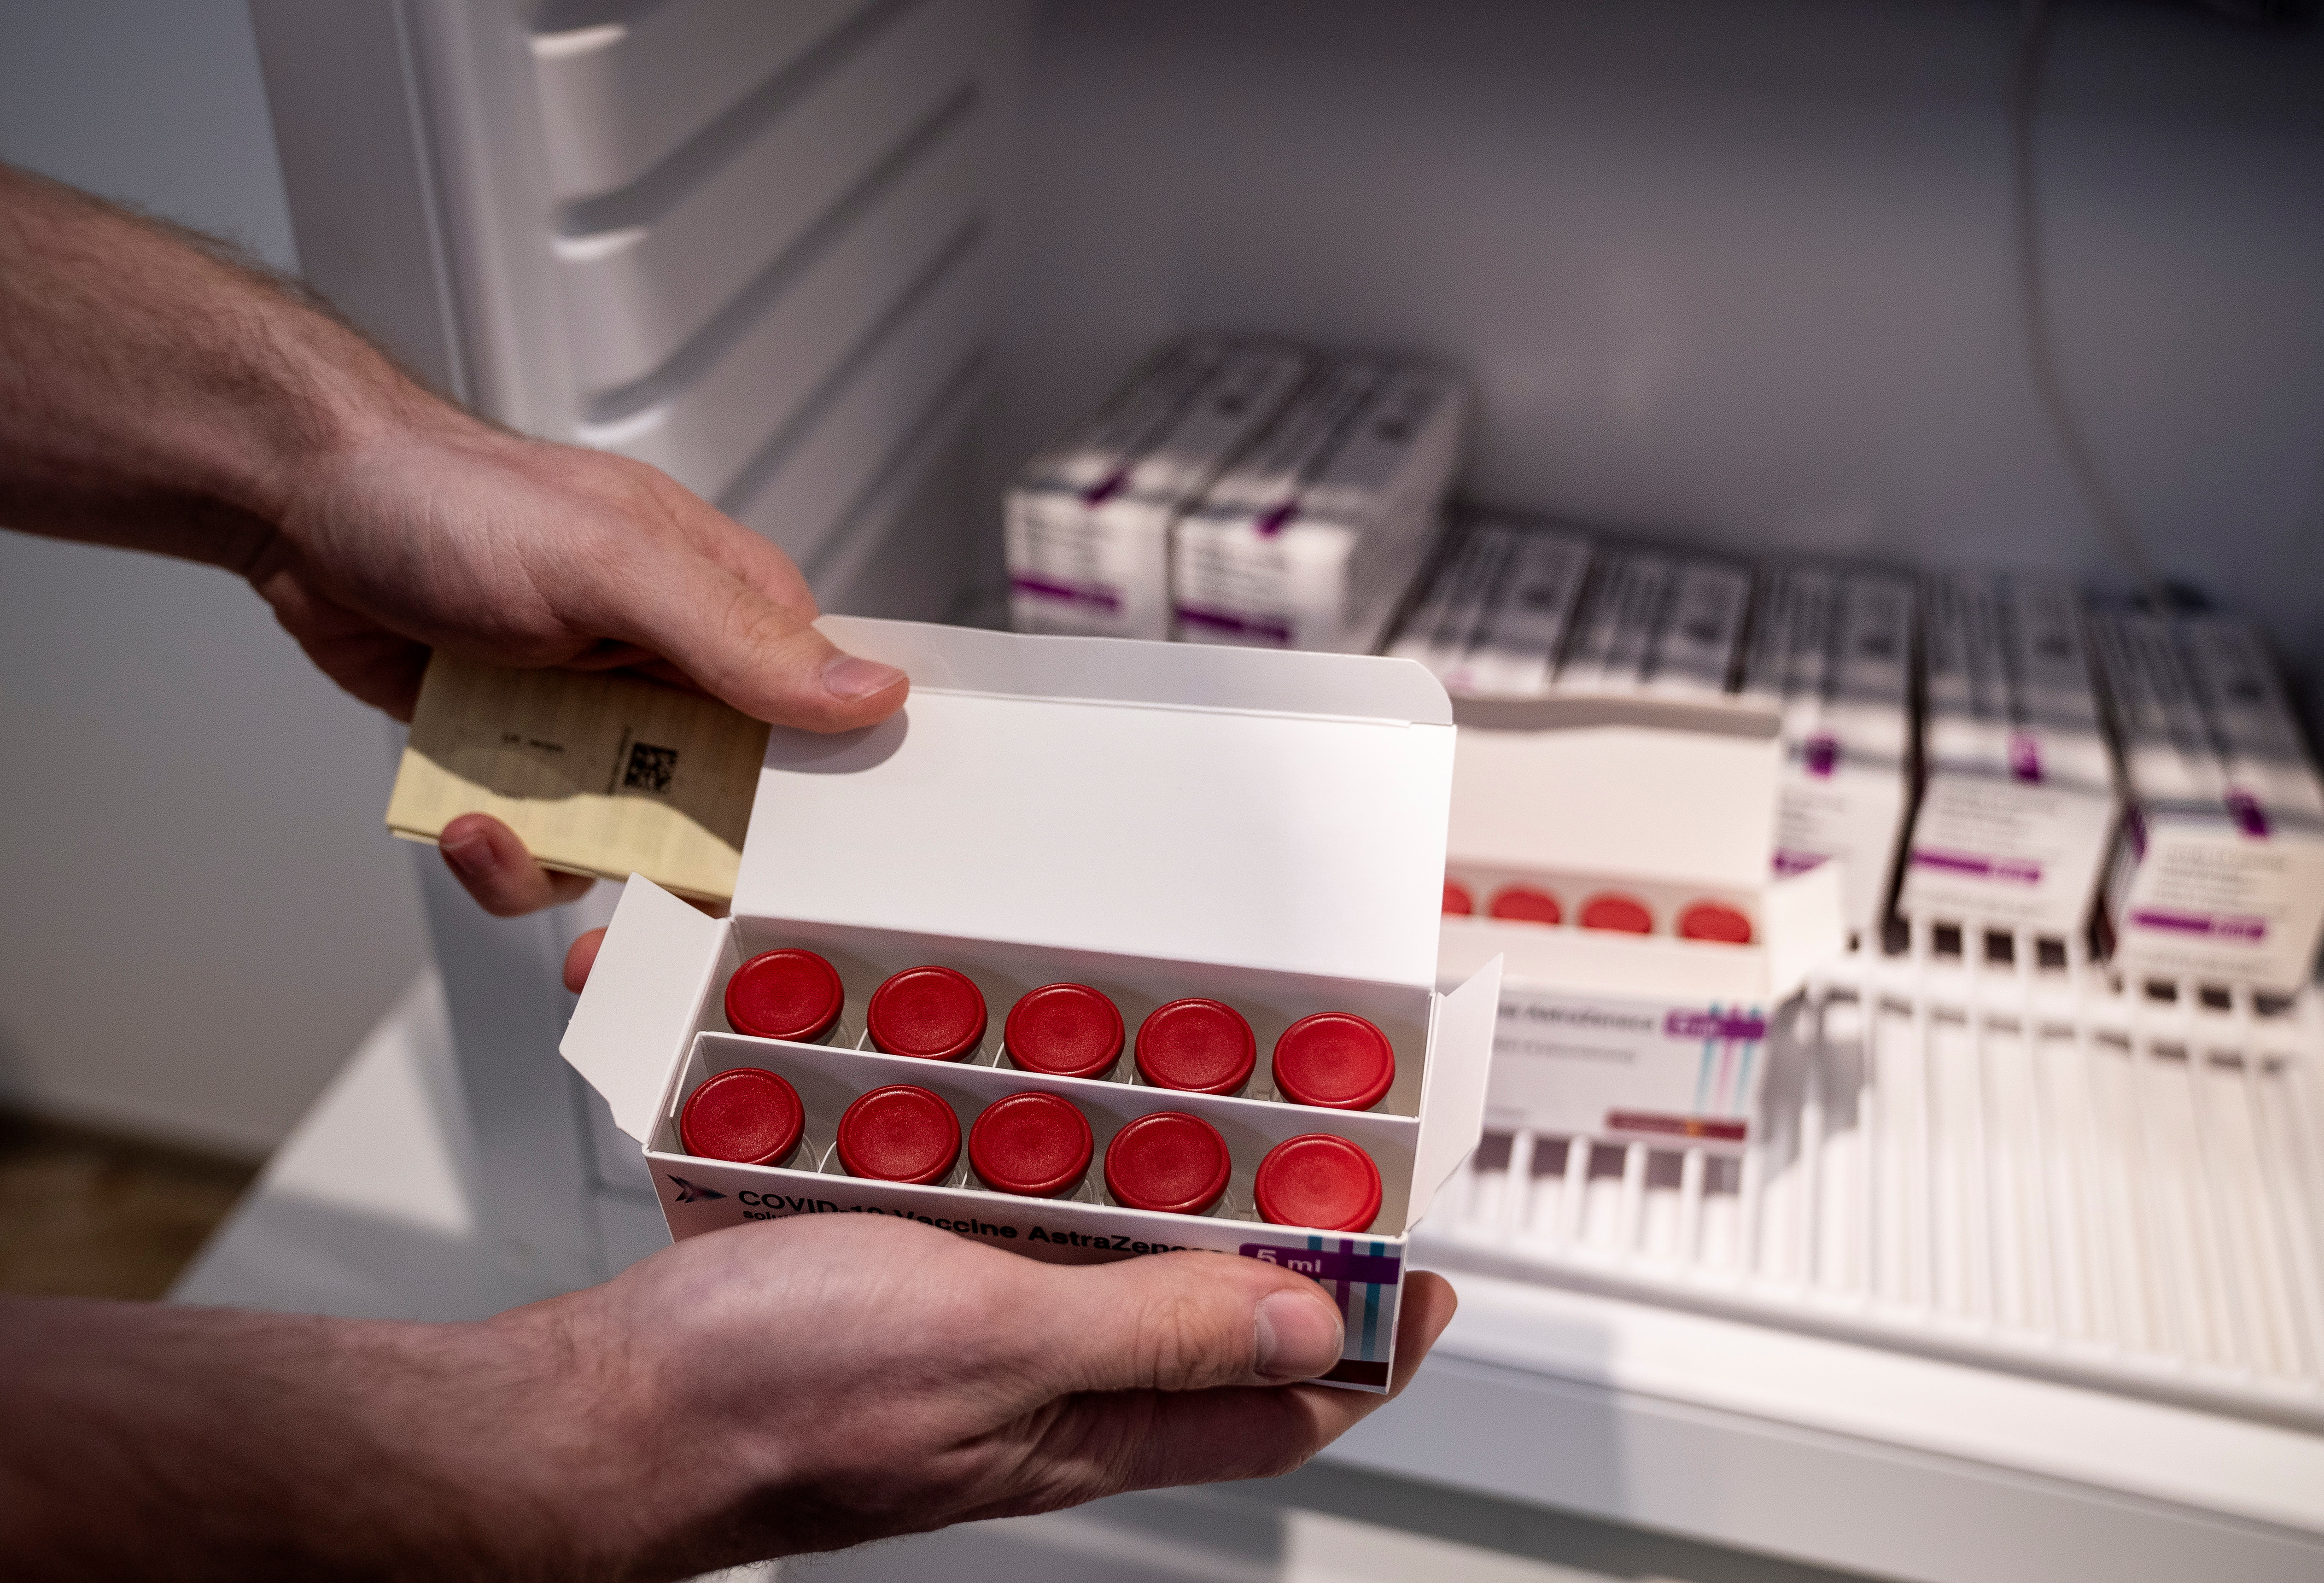 Staff member displays AstraZeneca COVID-19 vaccines in storage at Region Hovedstaden's Vaccine Center, Copenhagen, Denmark February 11, 2021. Ritzau Scanpix/Liselotte Sabroe via REUTERS